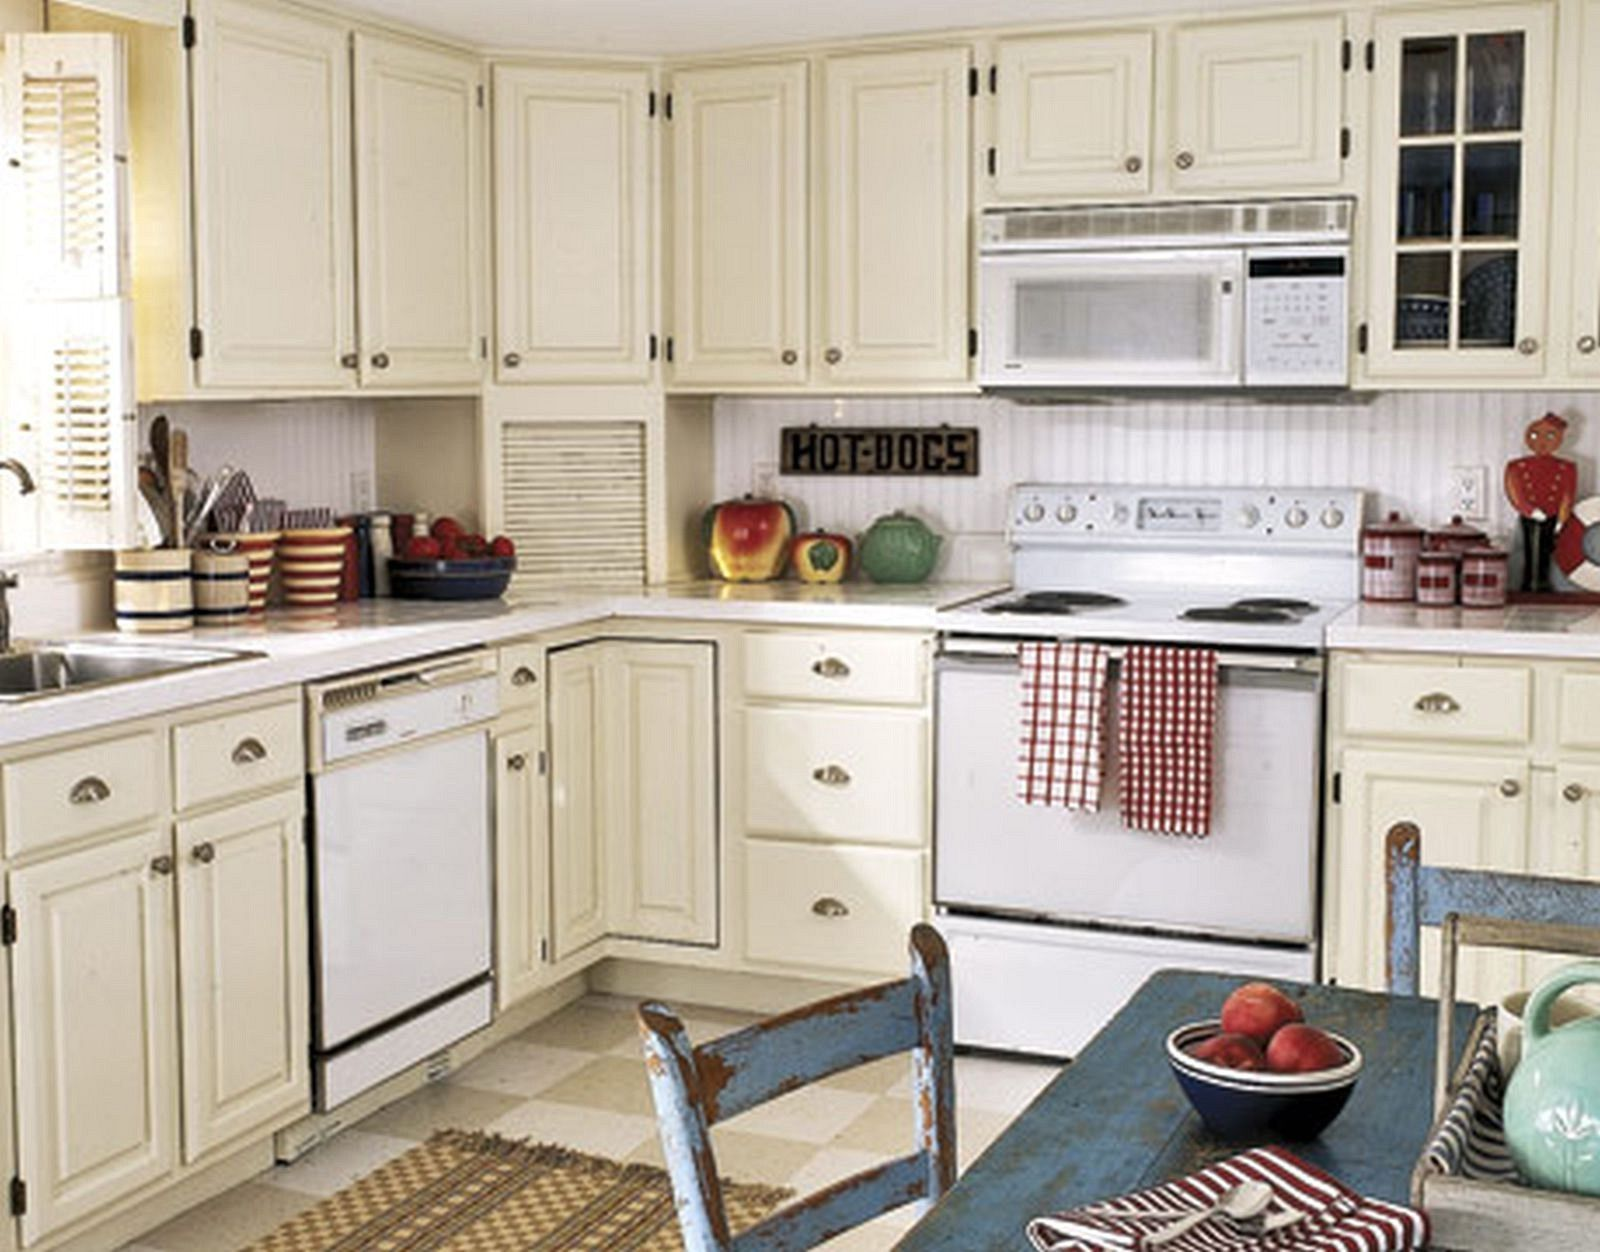 Kitchen Appliances Upscale Kitchen Appliances High End Appliance